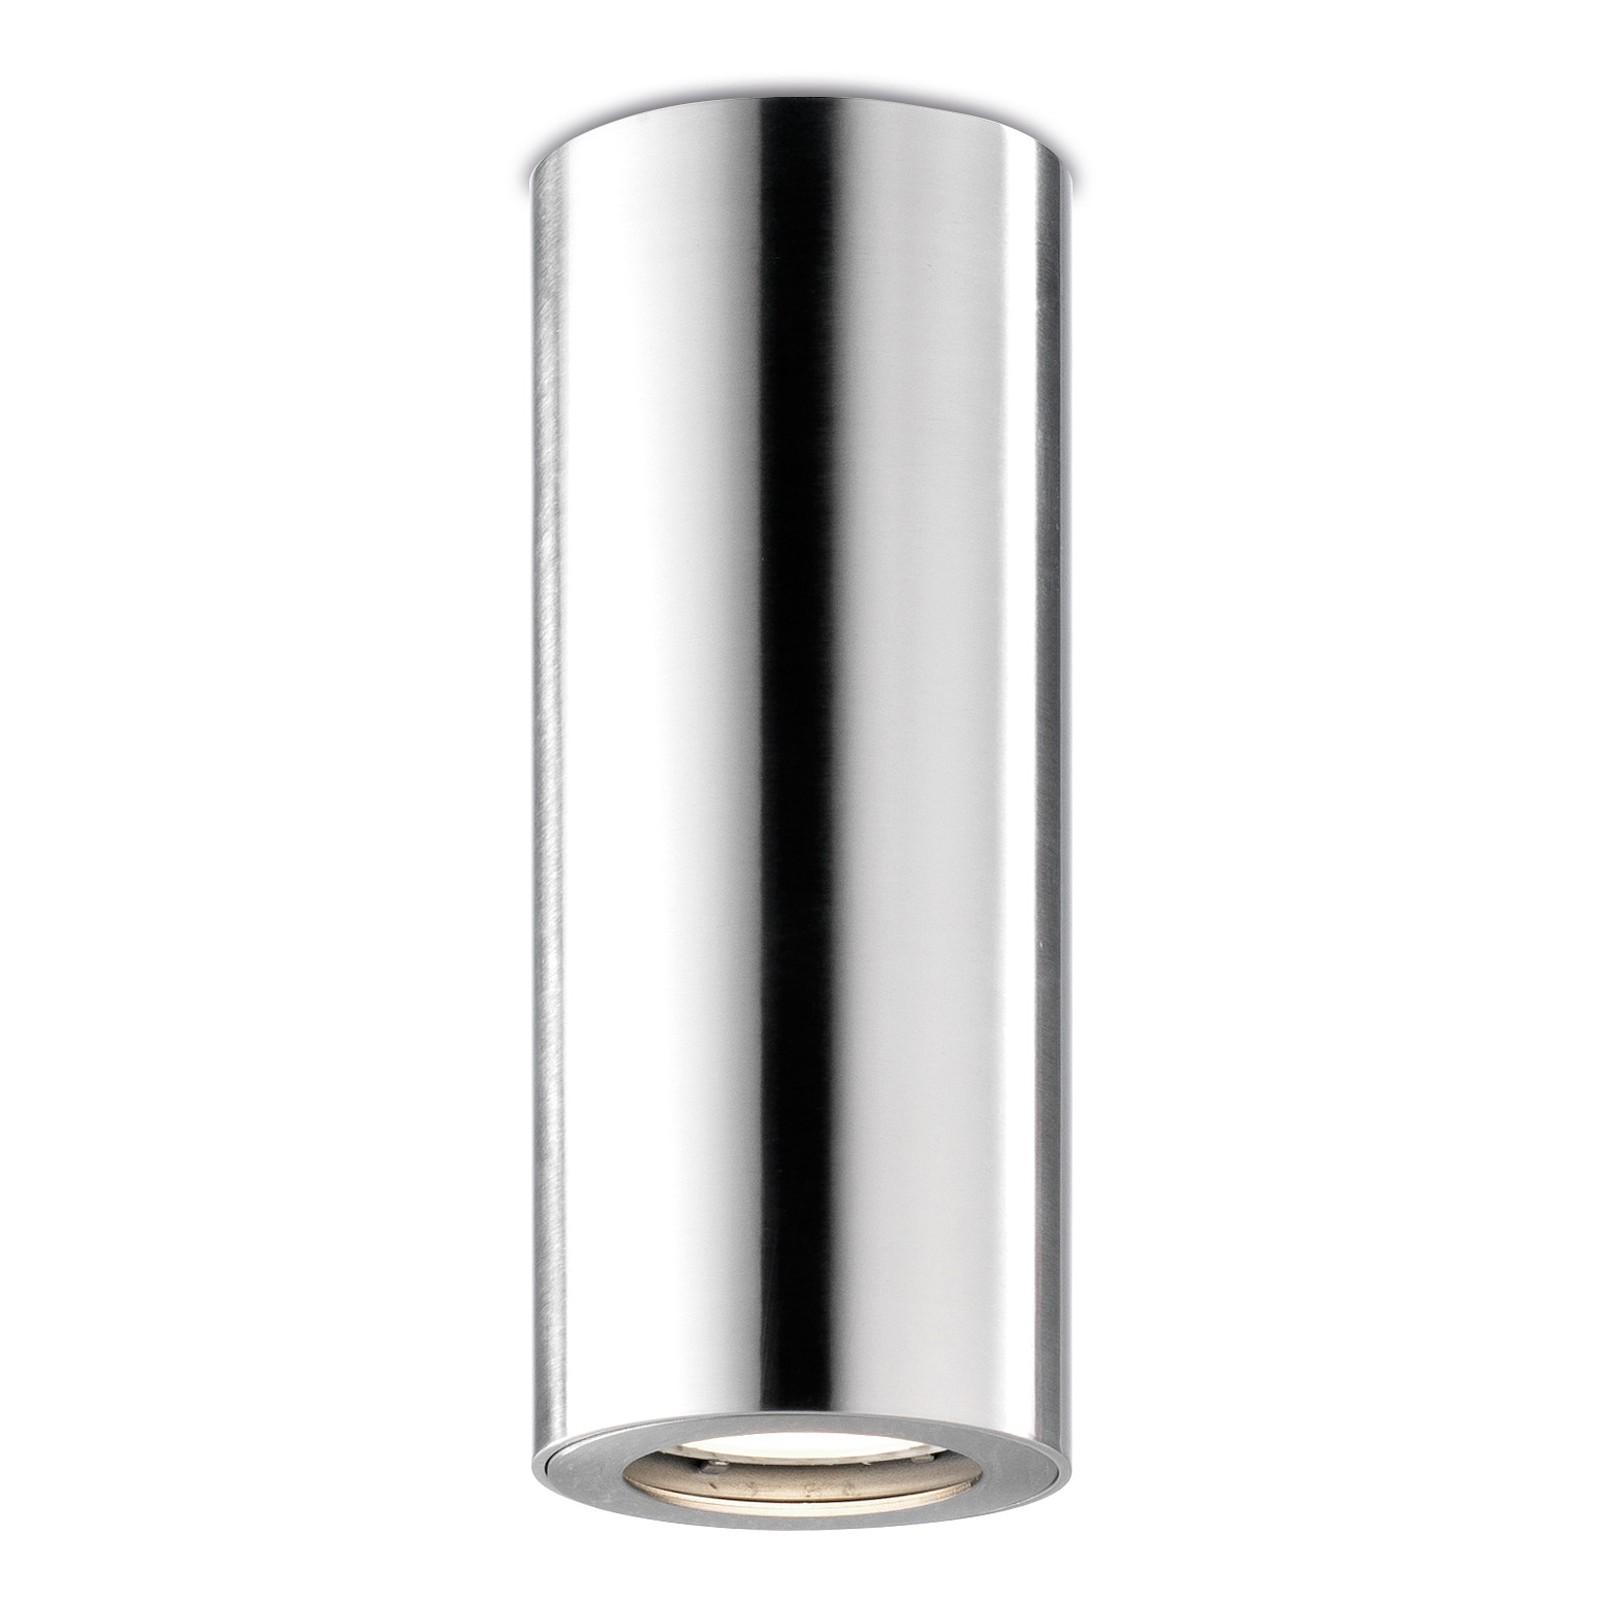 Lampada da soffitto a led lampadario moderno illuminazione for Illuminazione led a soffitto